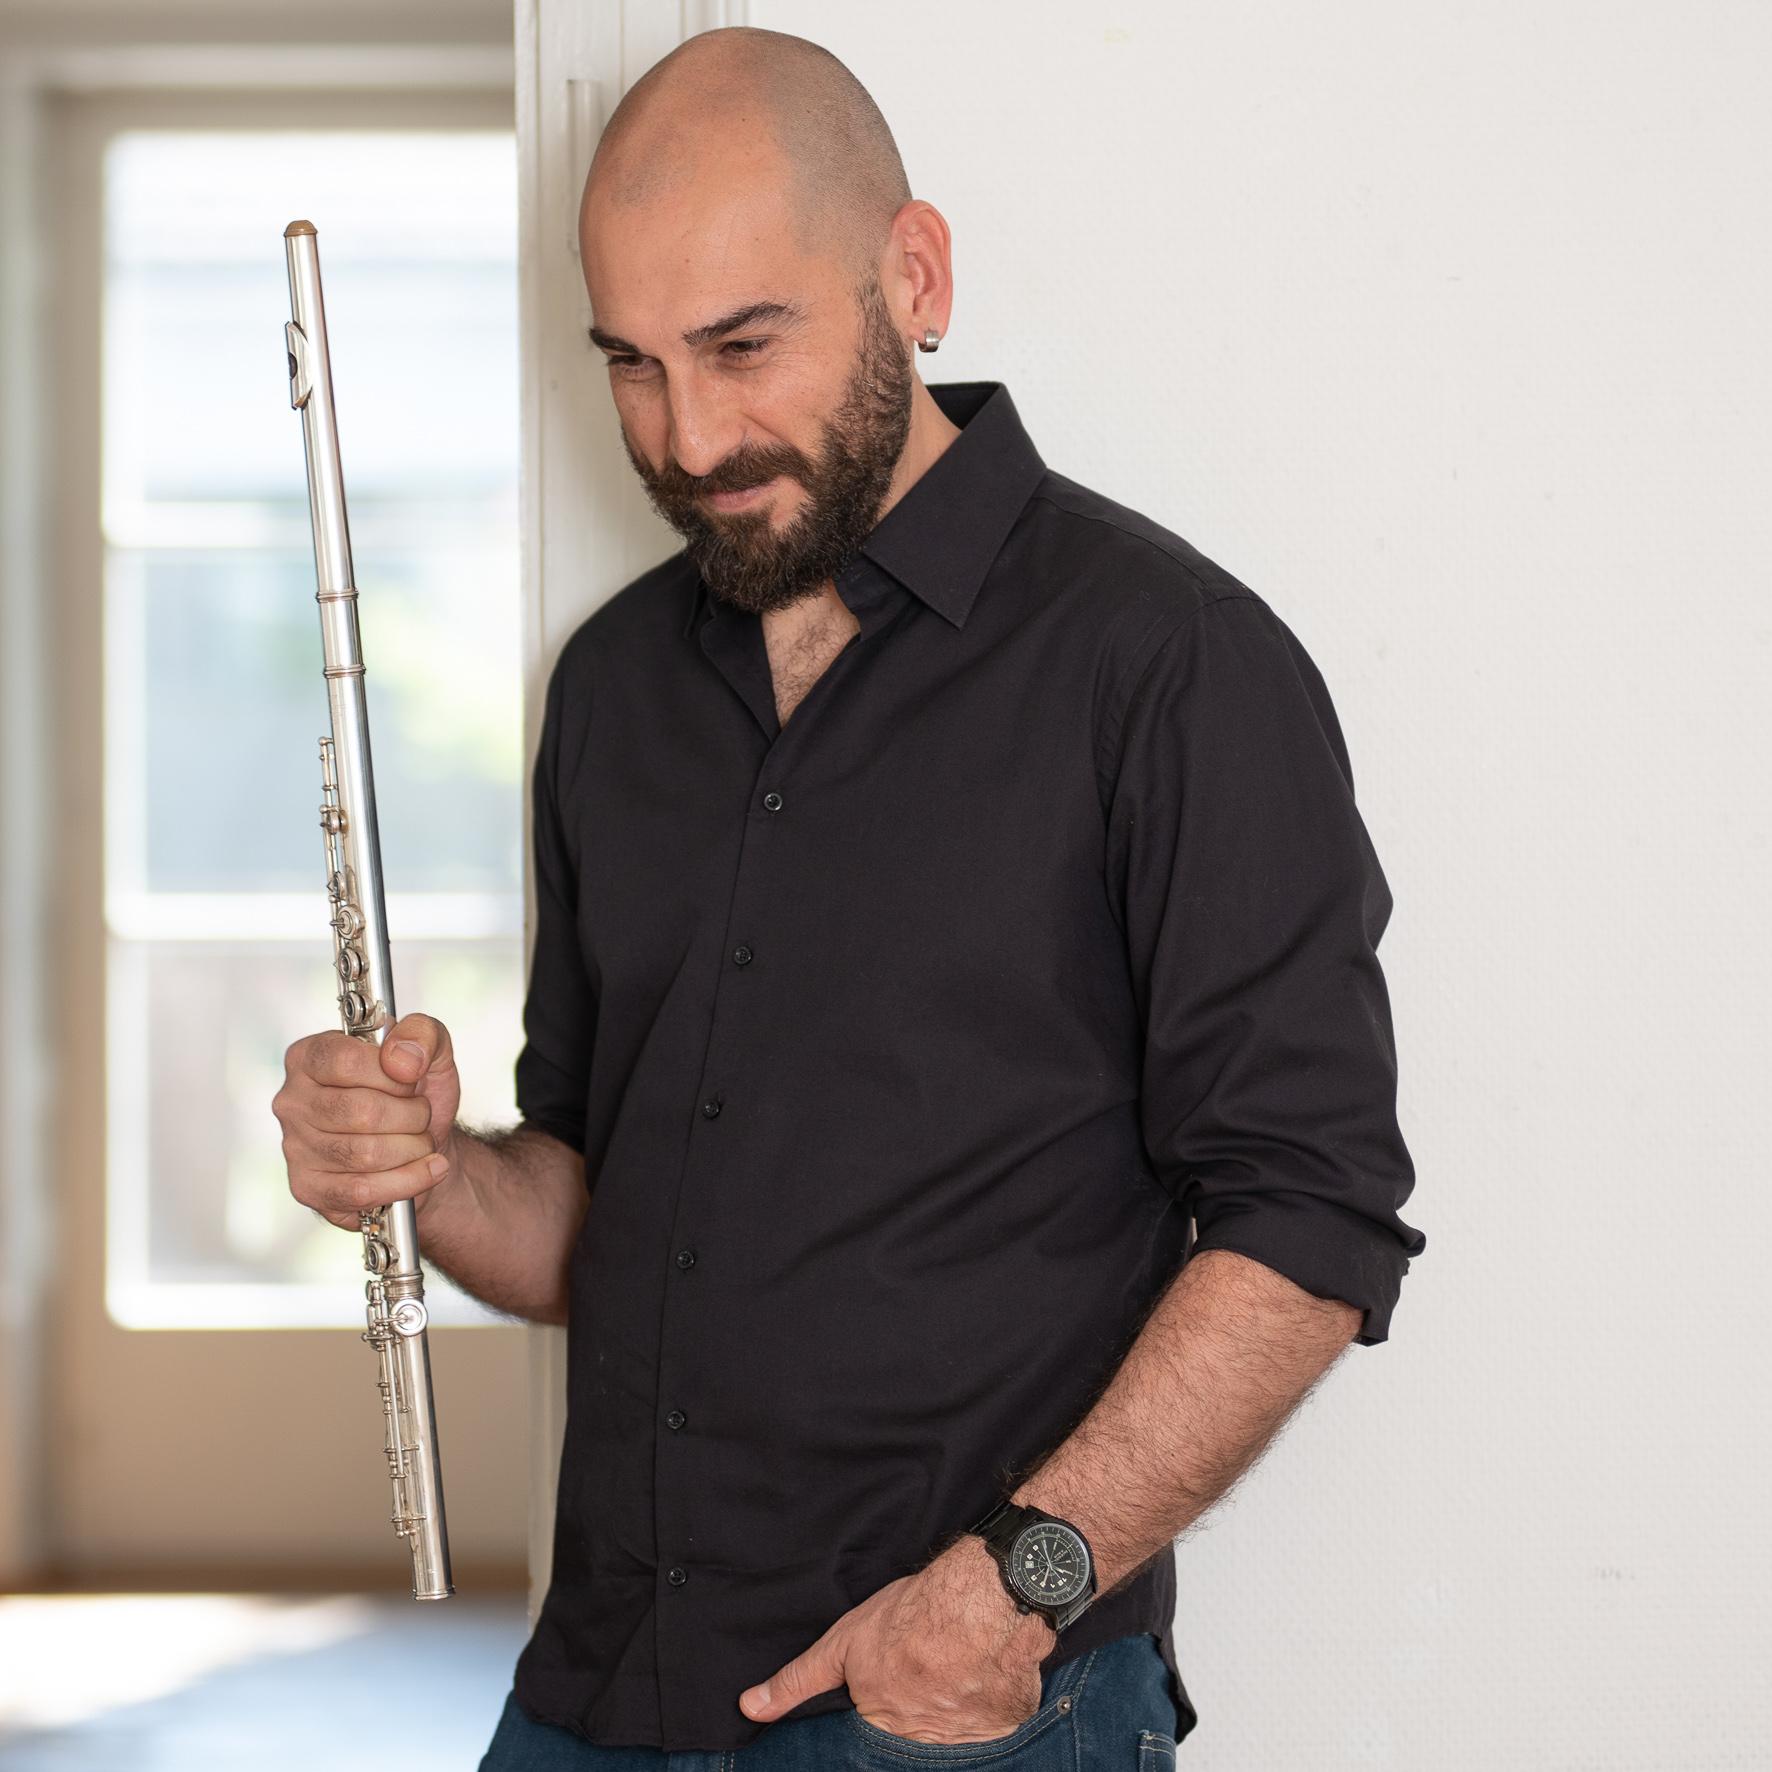 MUST Murat Cevik